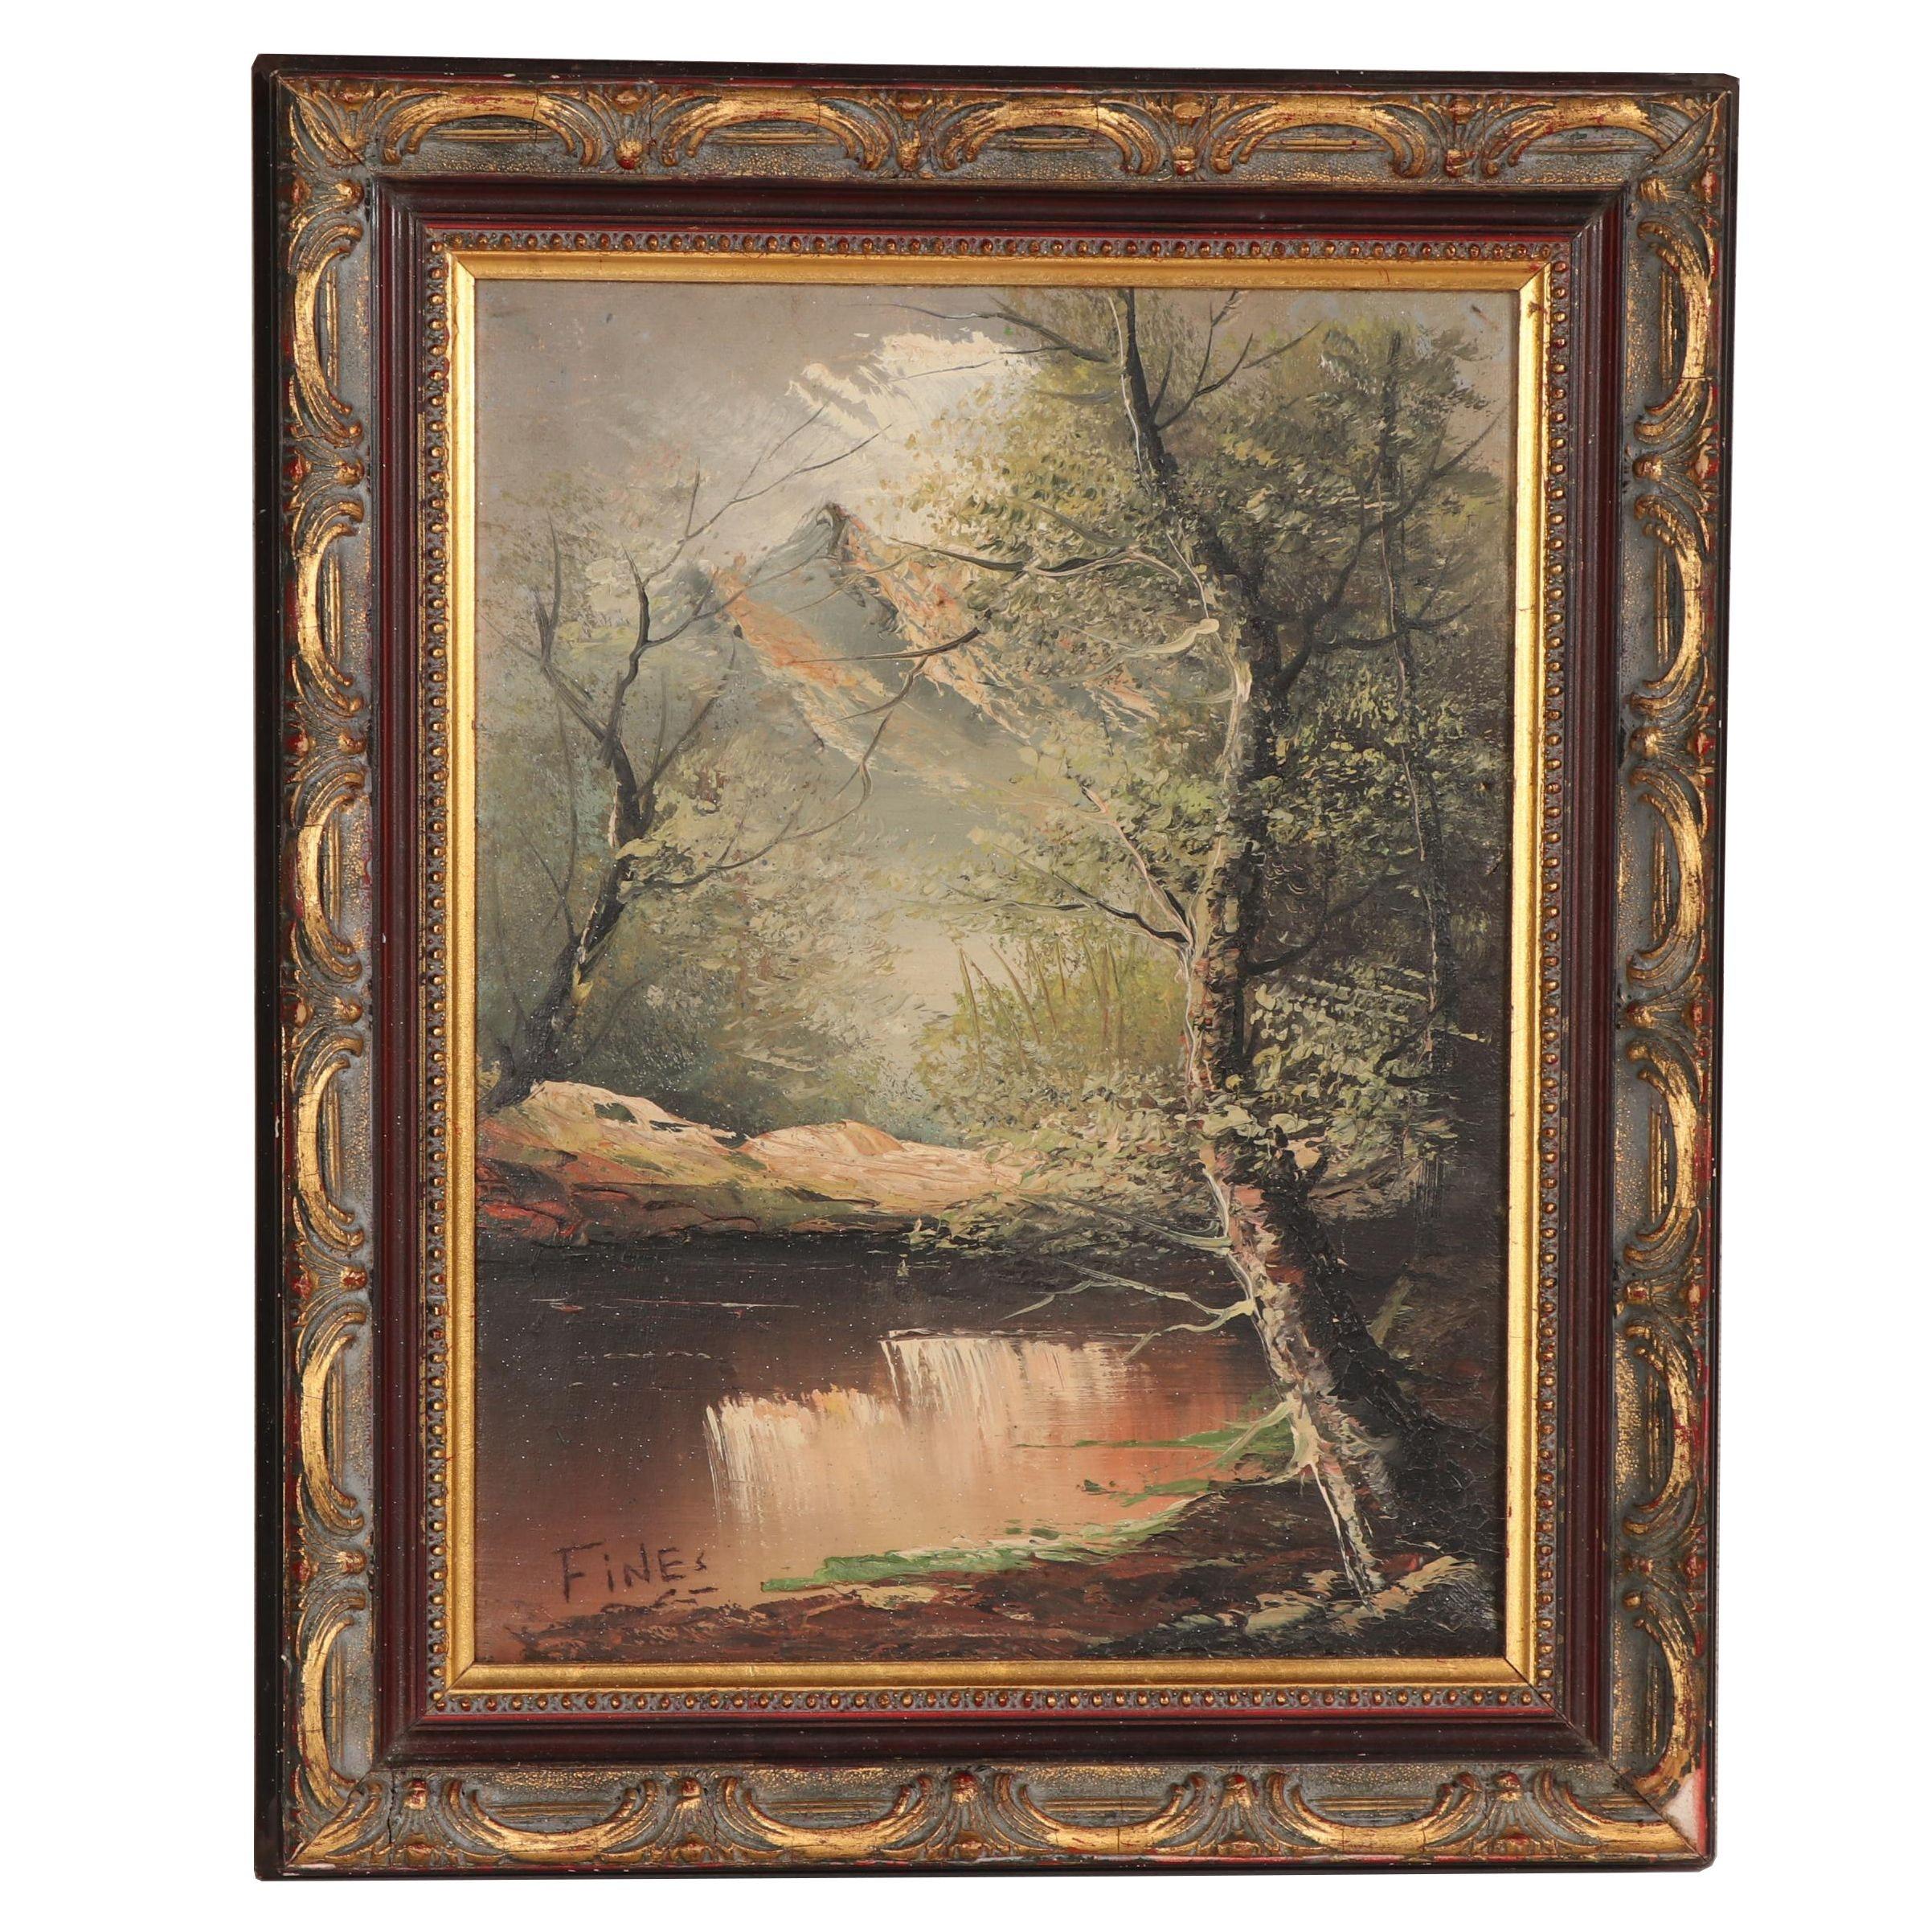 Scenic Landscape Oil Painting